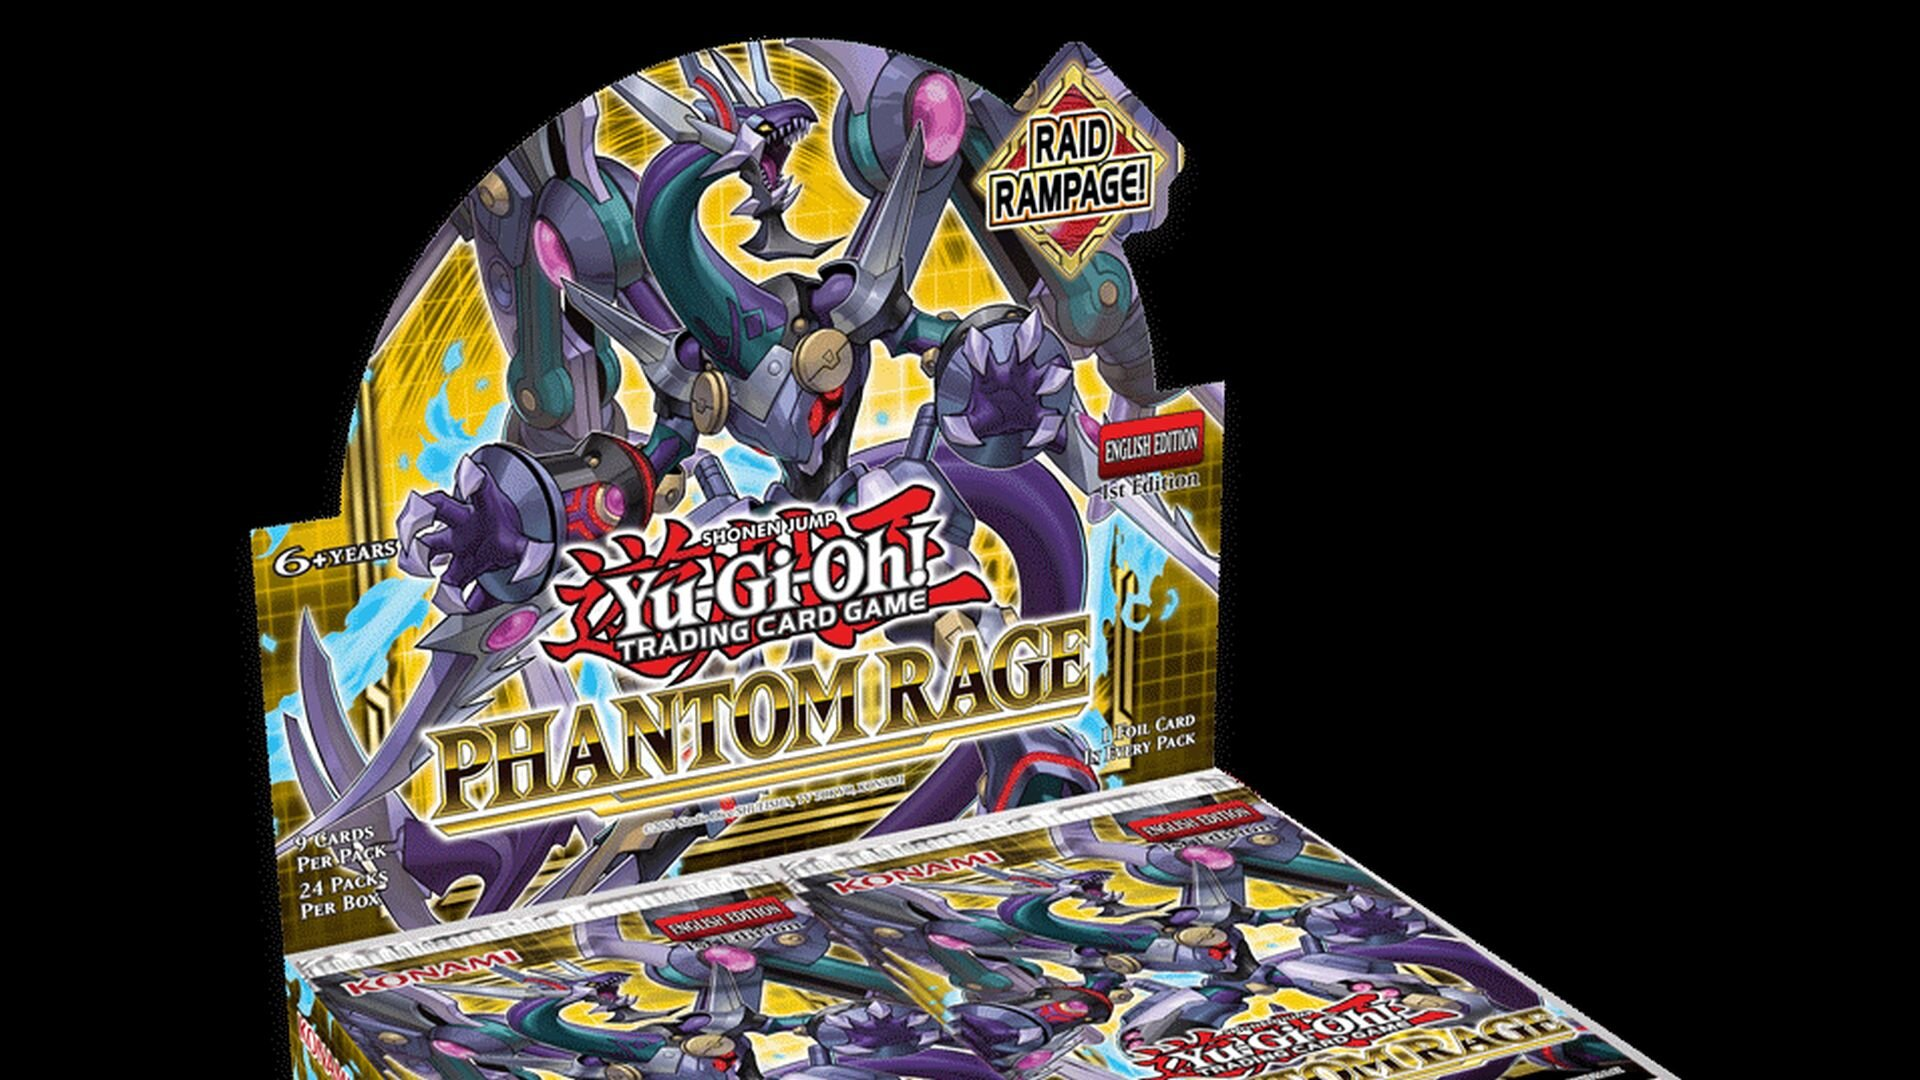 Raidraptors And Phantom Knights Are Coming Back To Yu Gi Oh With Phantom Rage Geektyrant